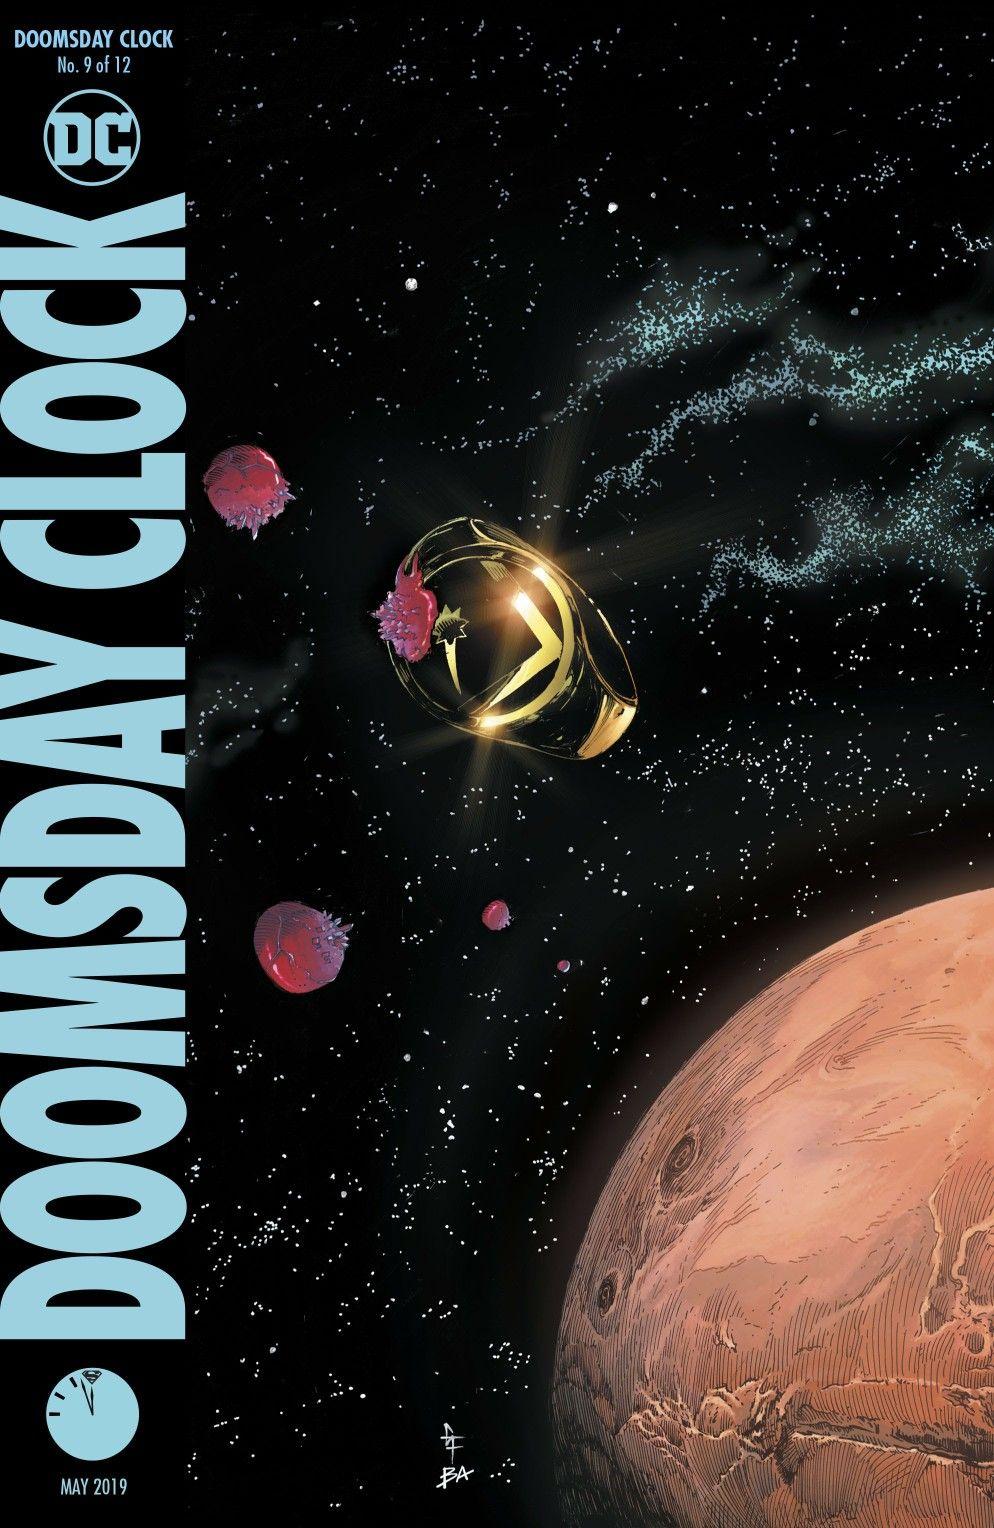 Doomsday Clock 9 In 2020 Doomsday Clock Doomsday Comic Reviews